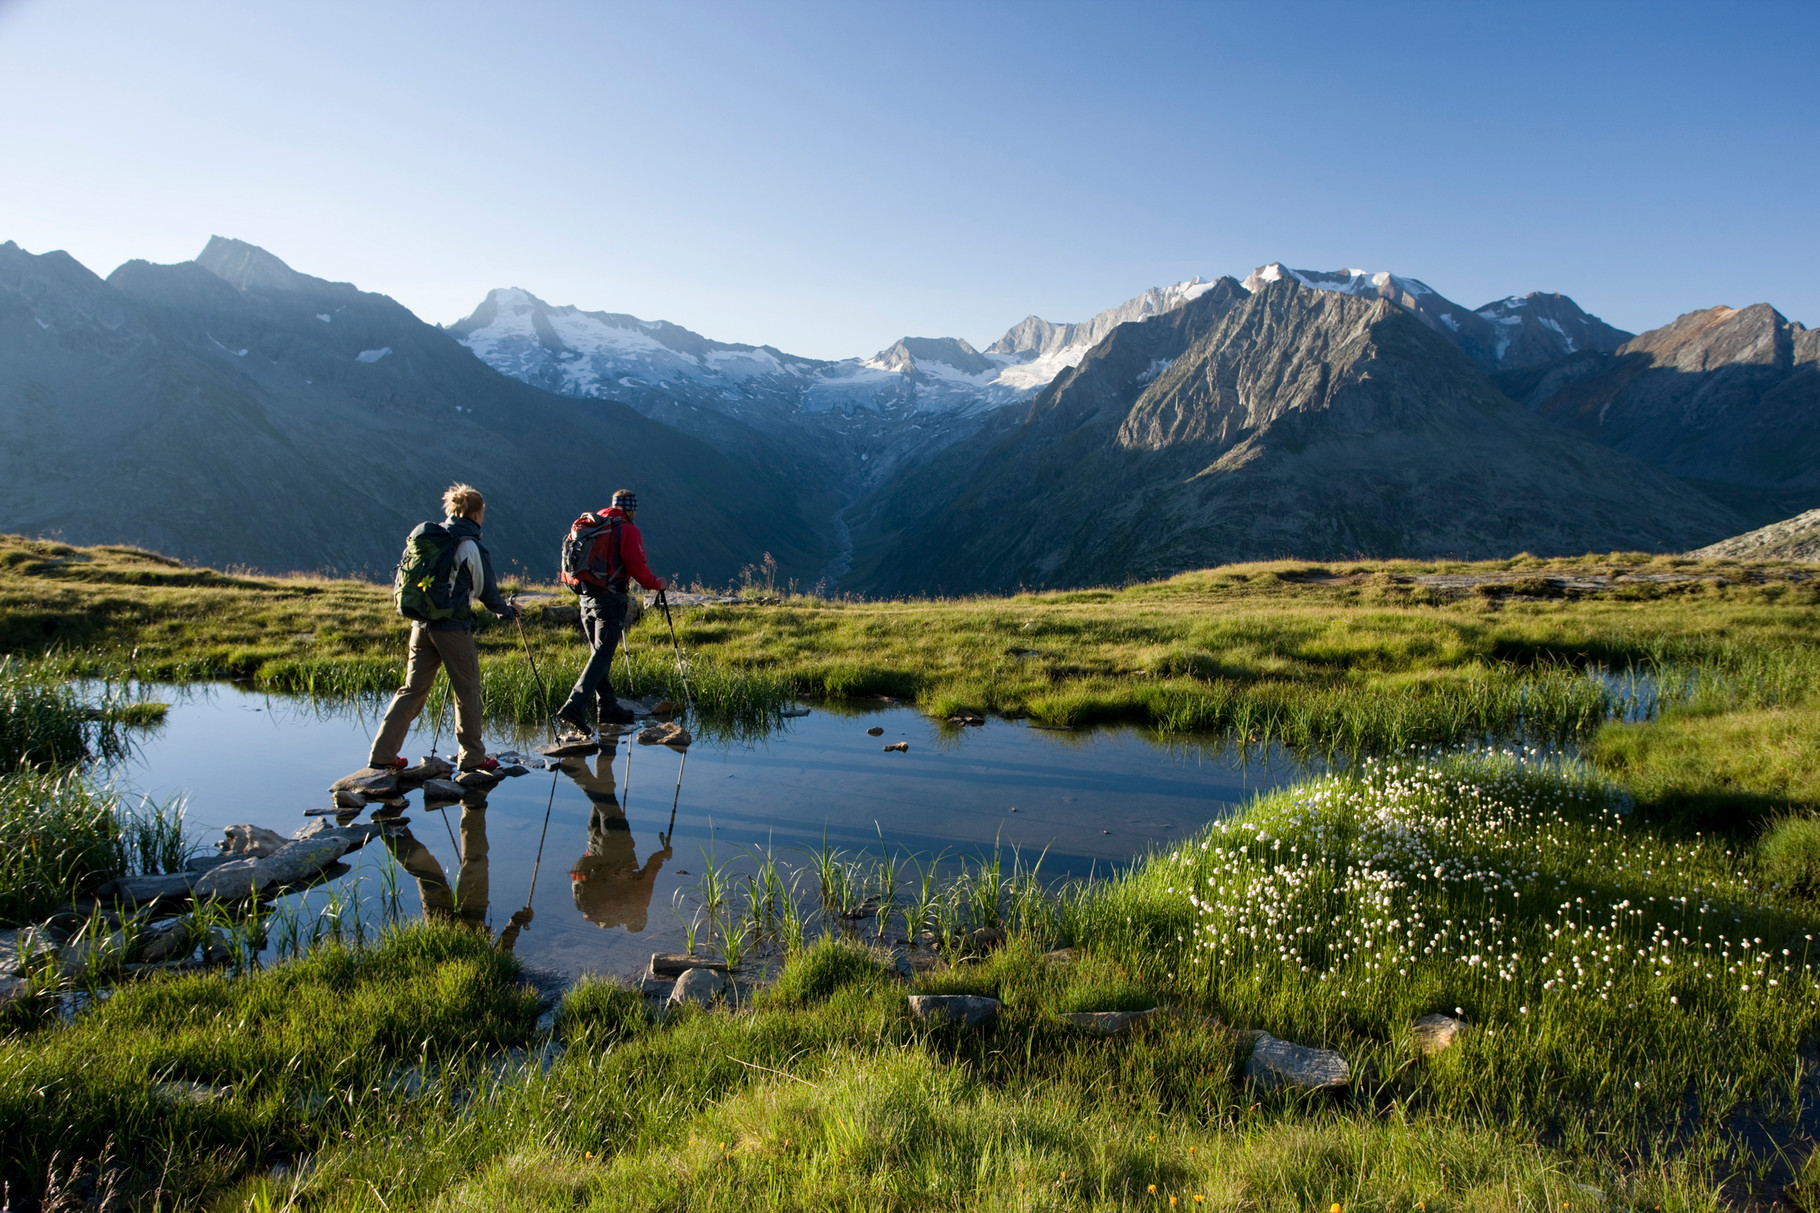 Wanderung entlang eines Bergsees zur Olpererhütte ©Zillertal Tourismus GmbH/Ritschel